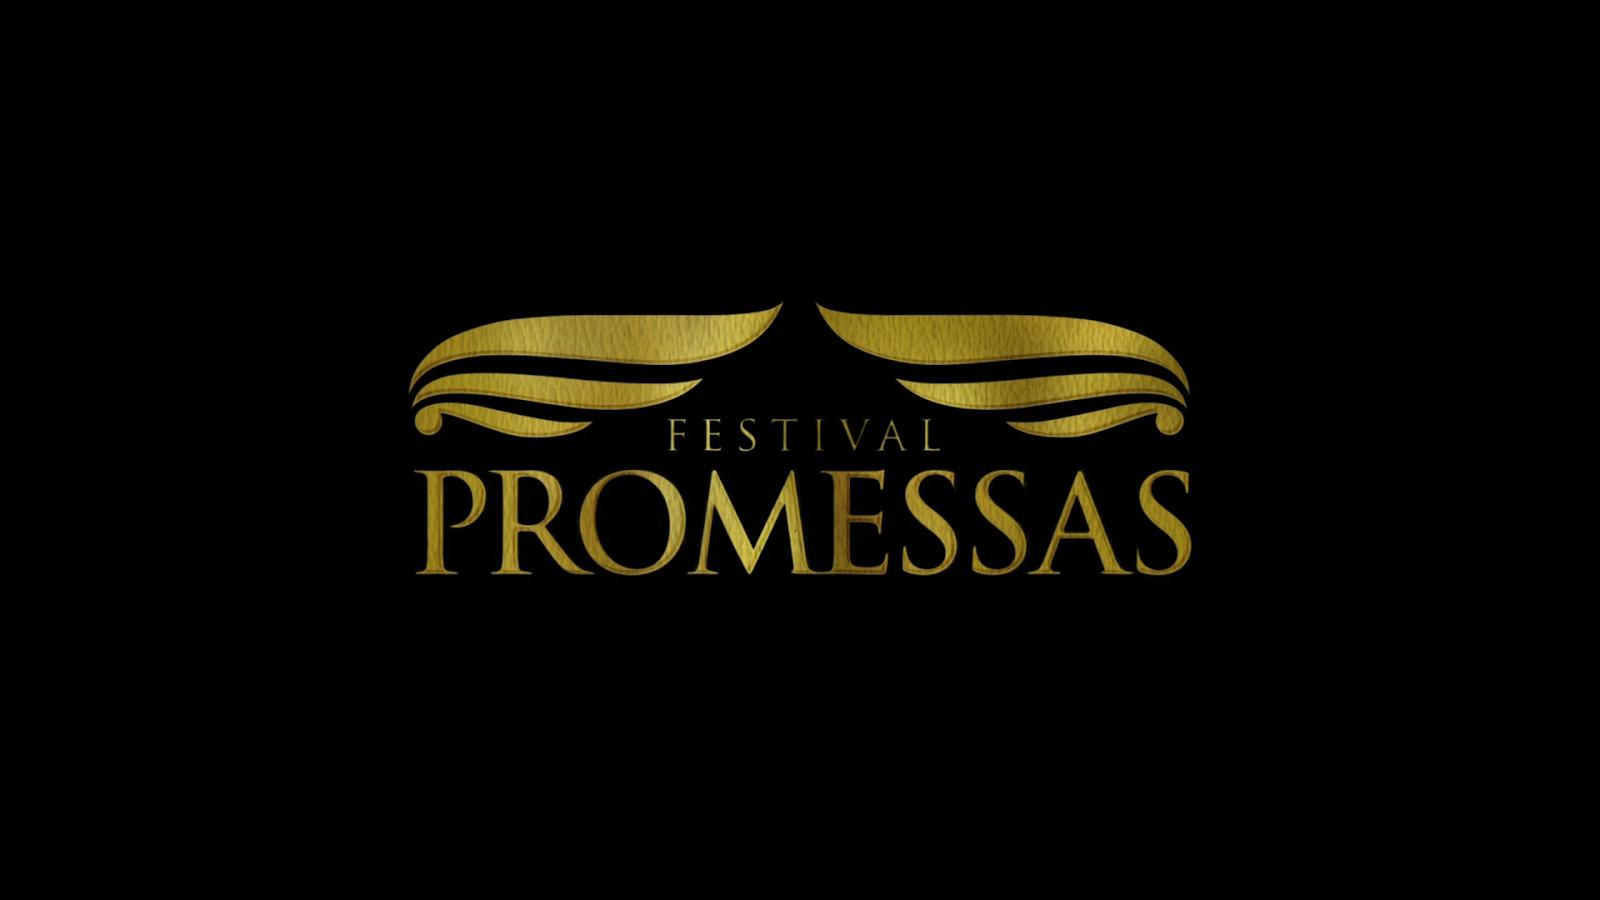 Festival Promessas 2013 – HDTV